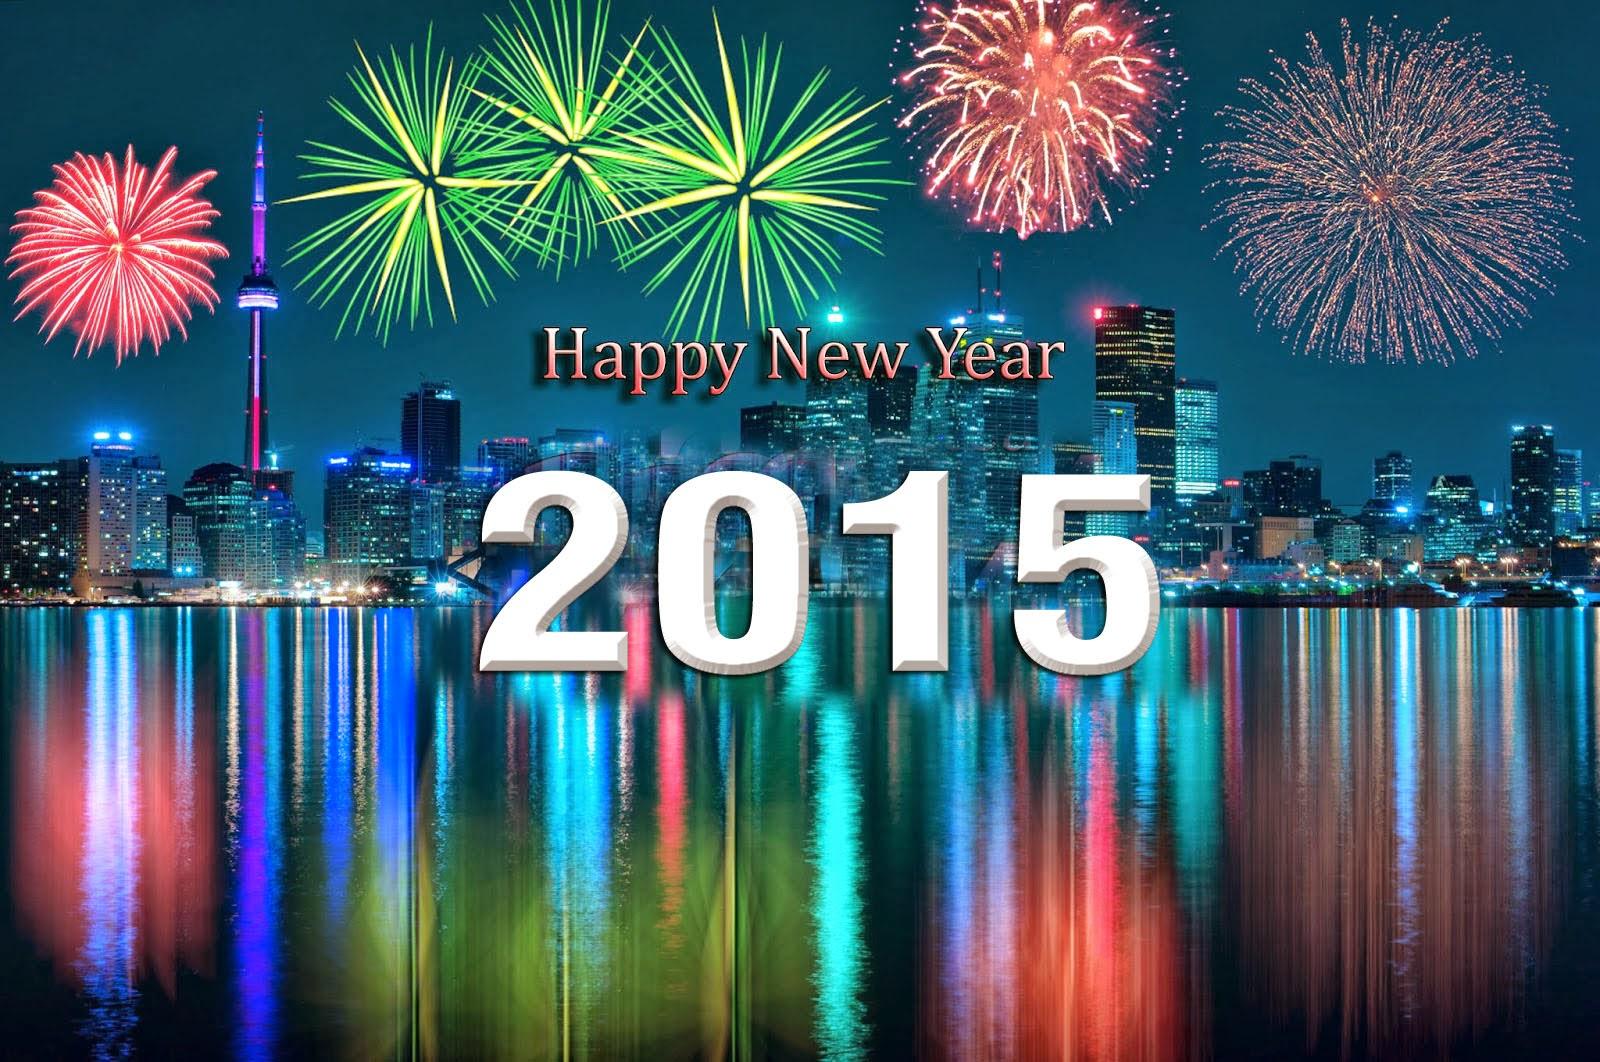 splendid new year wallpapers 2015 forestwonders 1600x1062